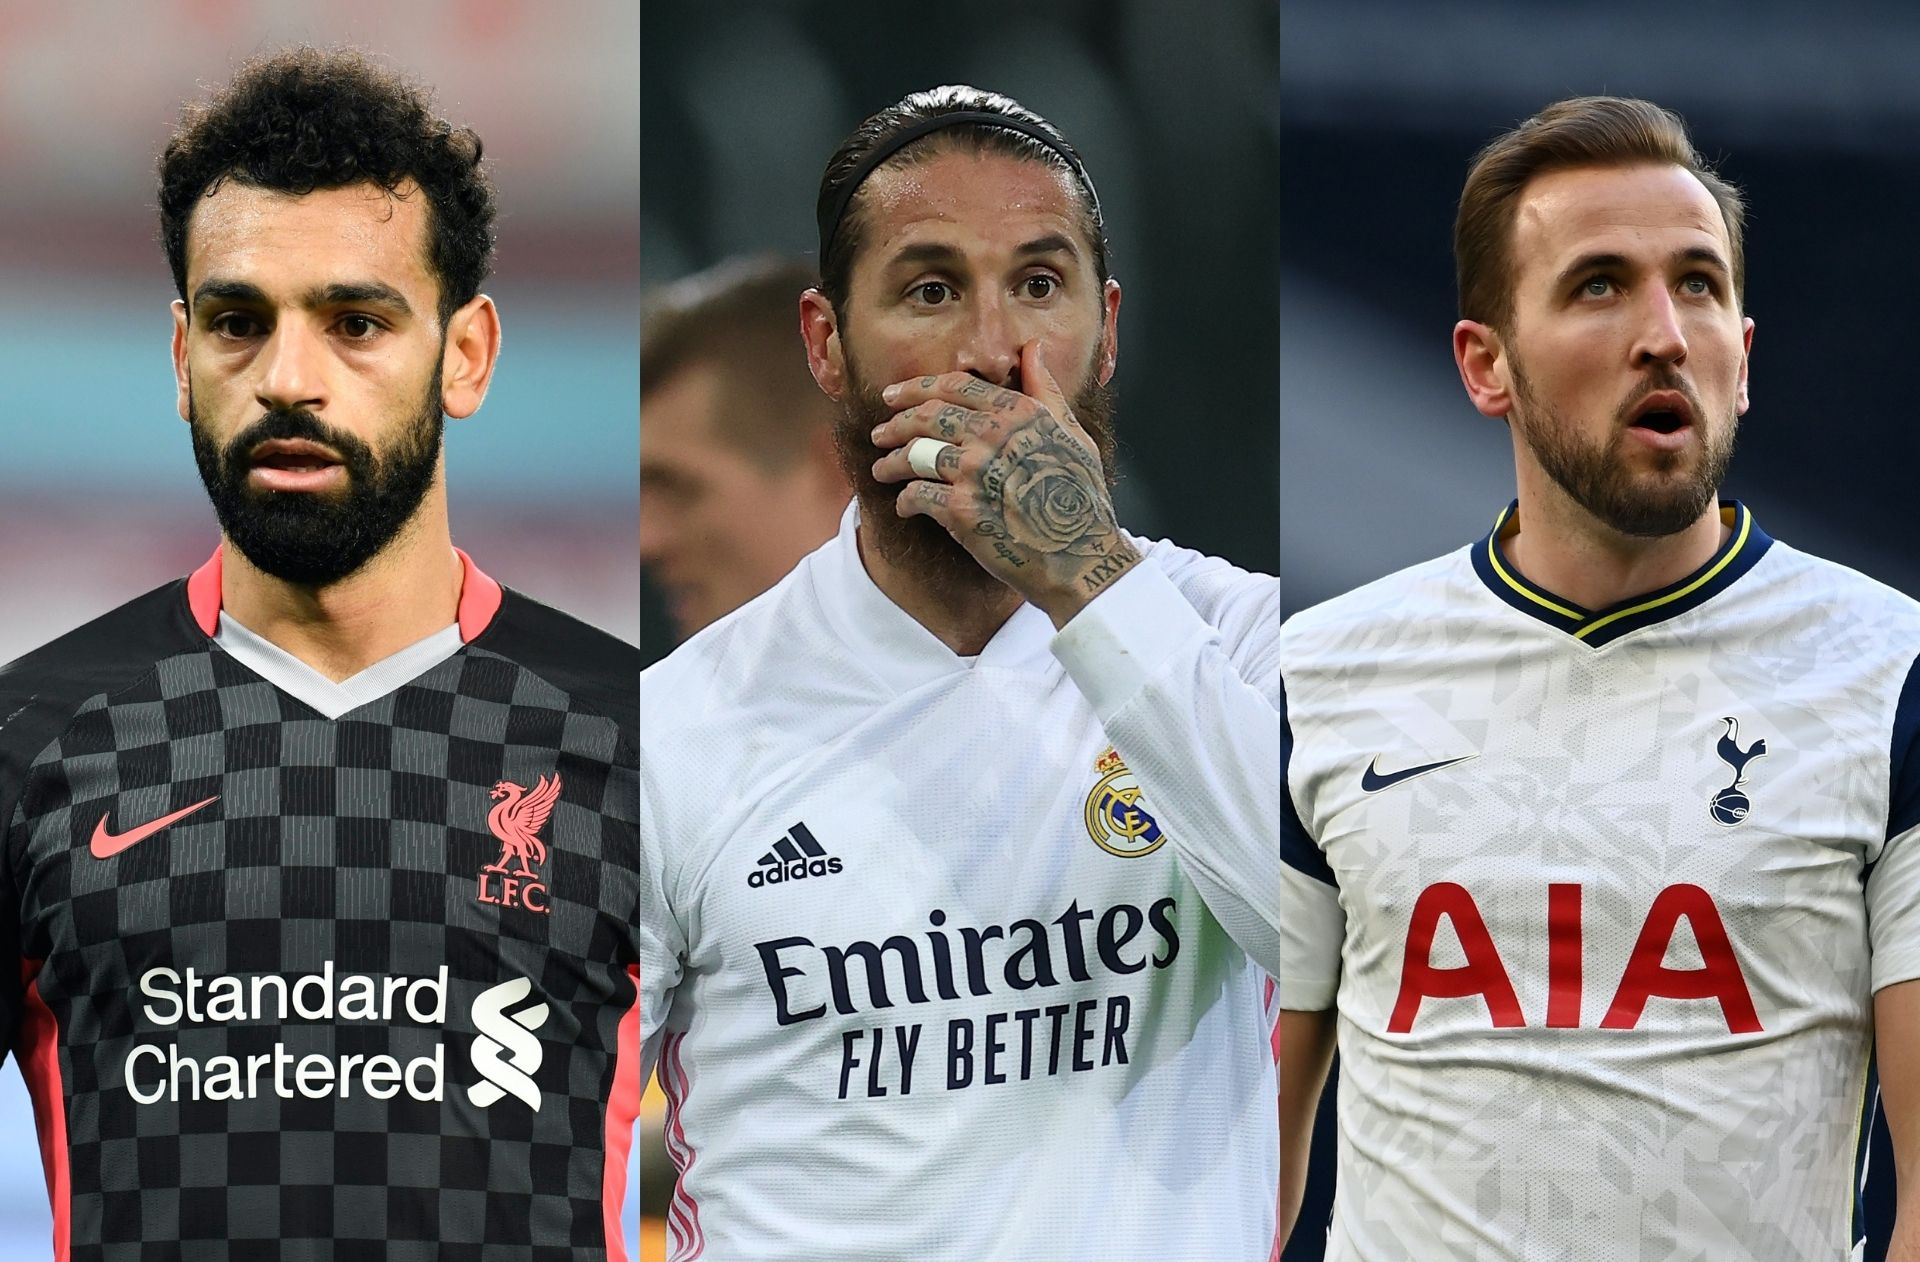 Wednesday's transfer rumors - Real Madrid's No.1 transfer target revealed